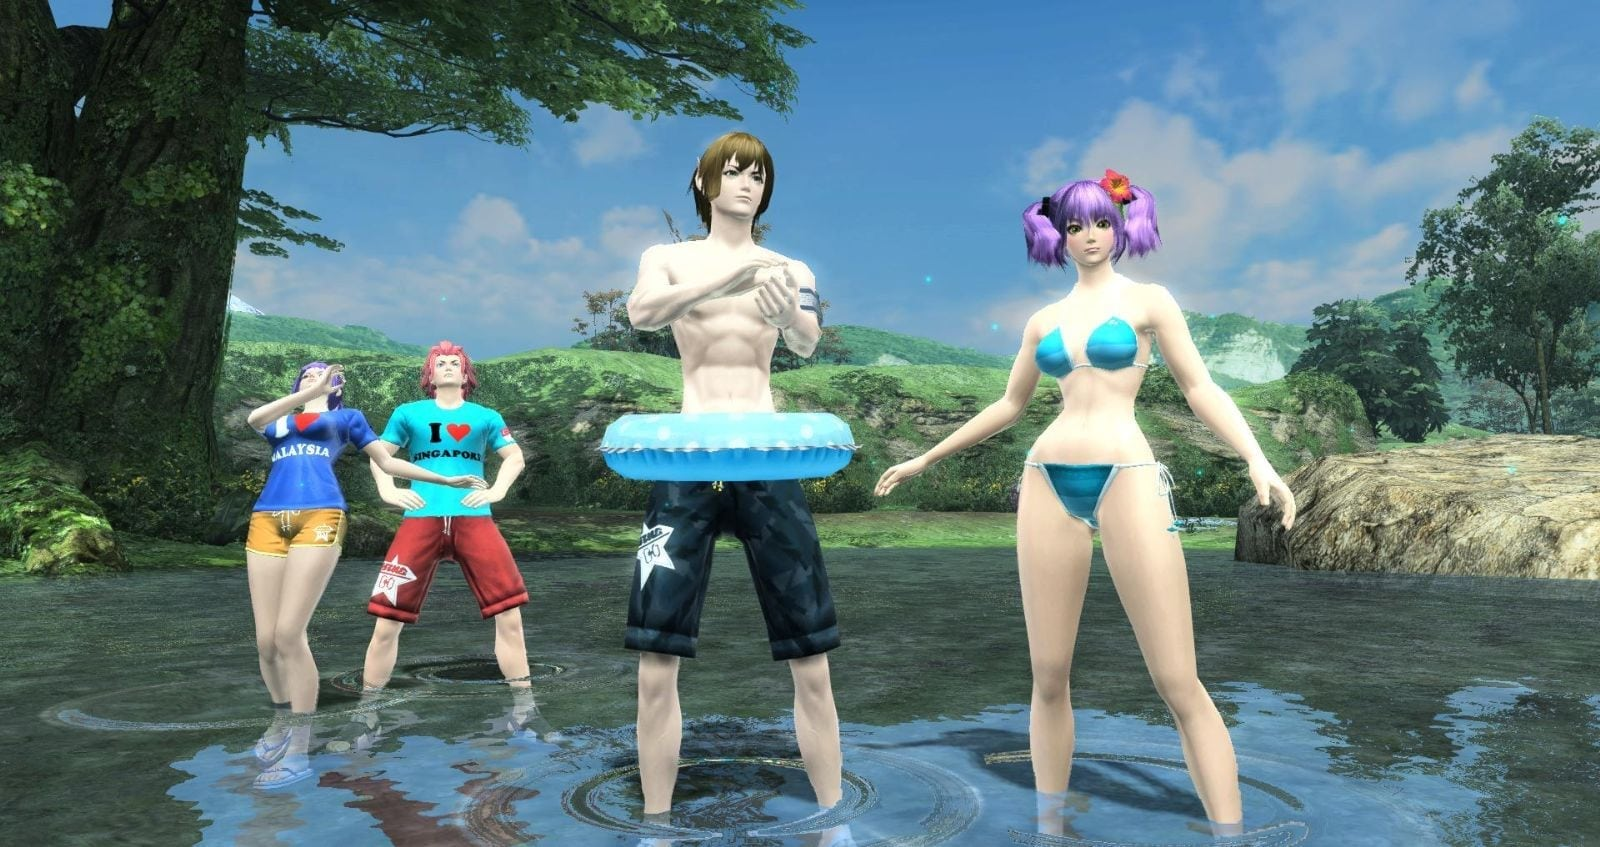 Phantasy Star Online 2 SEA - Summer costumes 2